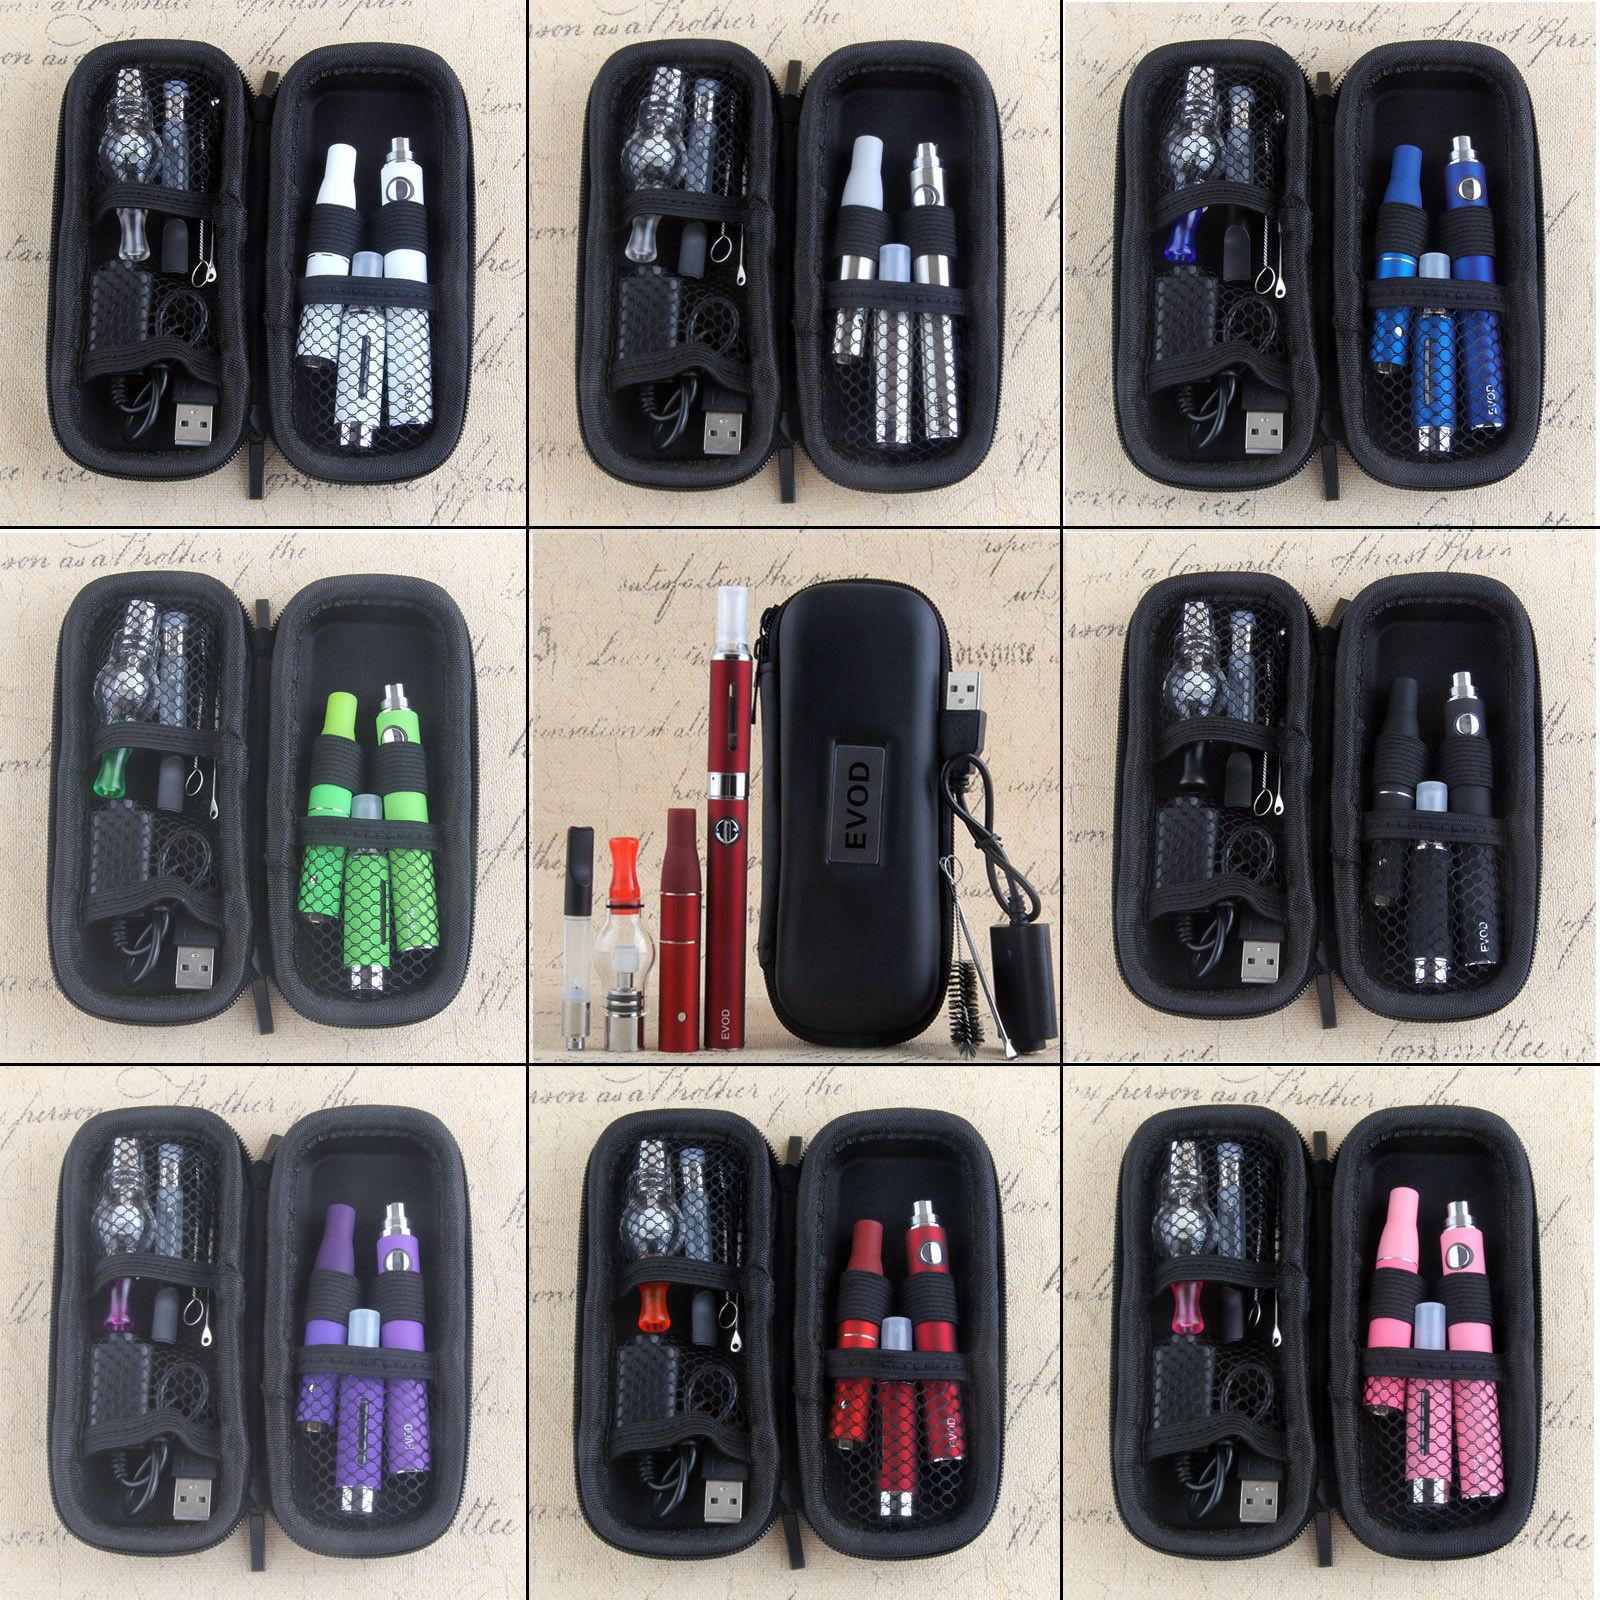 Vaporizer 1100 MAH 4 in 1 Dry herb mini kit dry Herbal wax Vape Pen Rechargeable